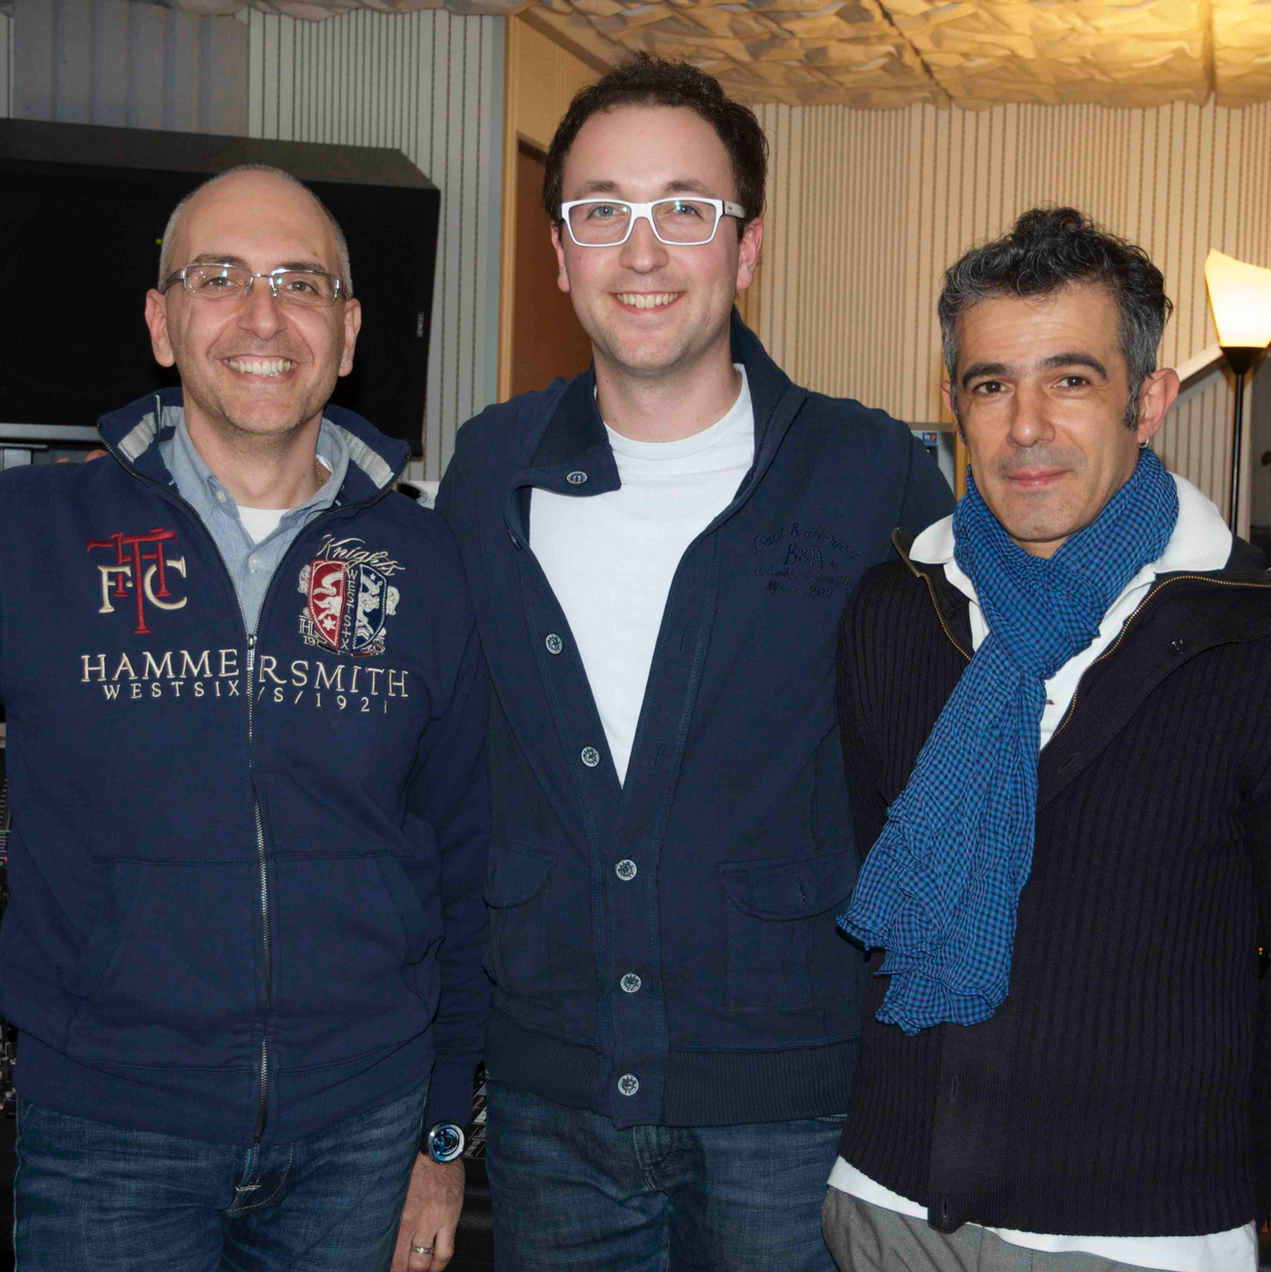 With Stefano Amerio and Paolo Fresu